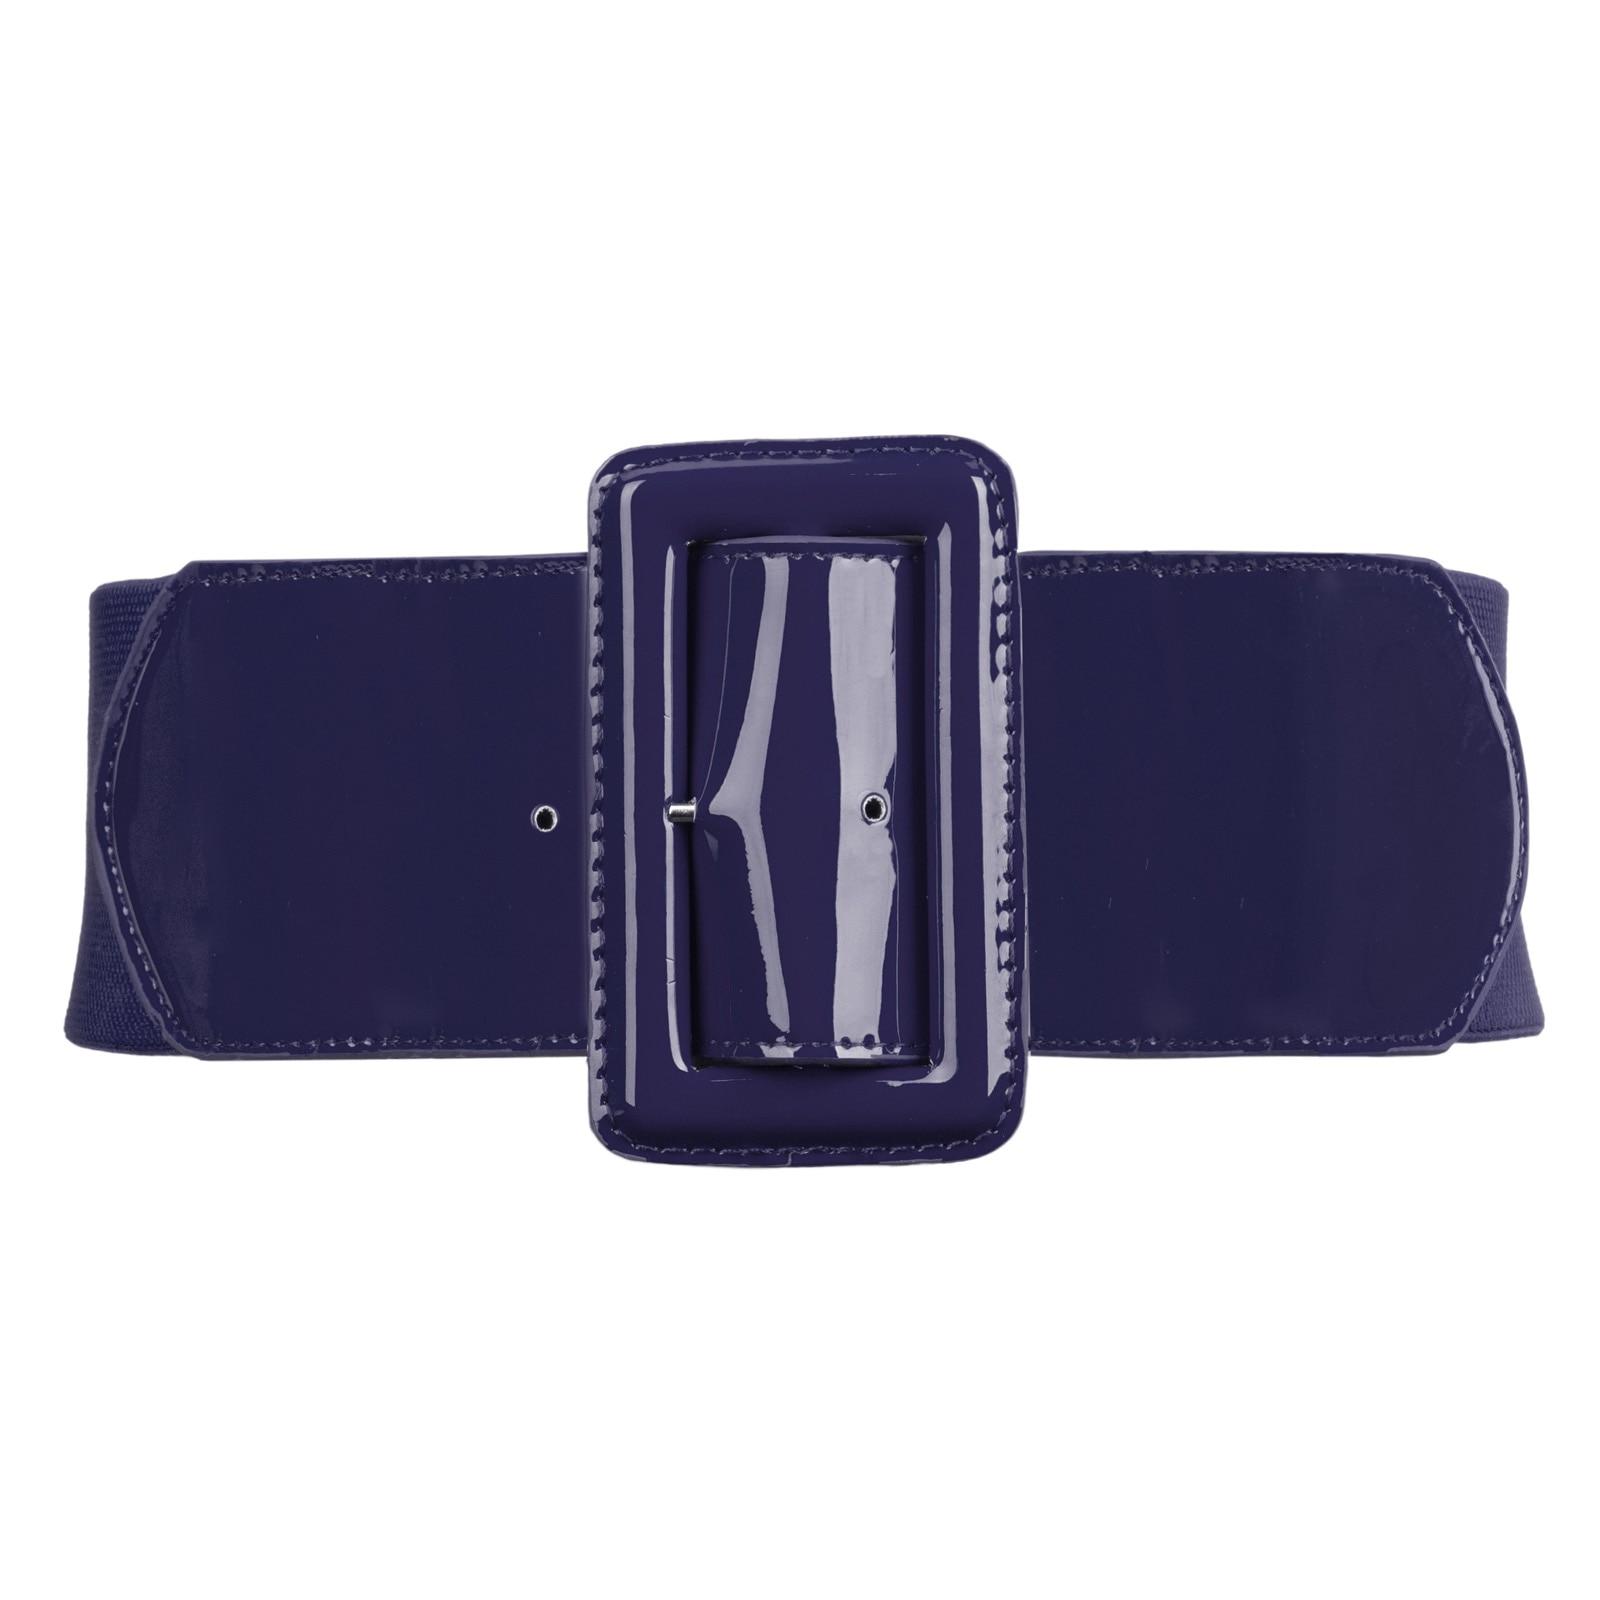 GK  Belt For Women Lady Wide Belts Brand Design Solid Color Metal Buckle Stretchy Elastic Waist Belt Waistband Plus Size